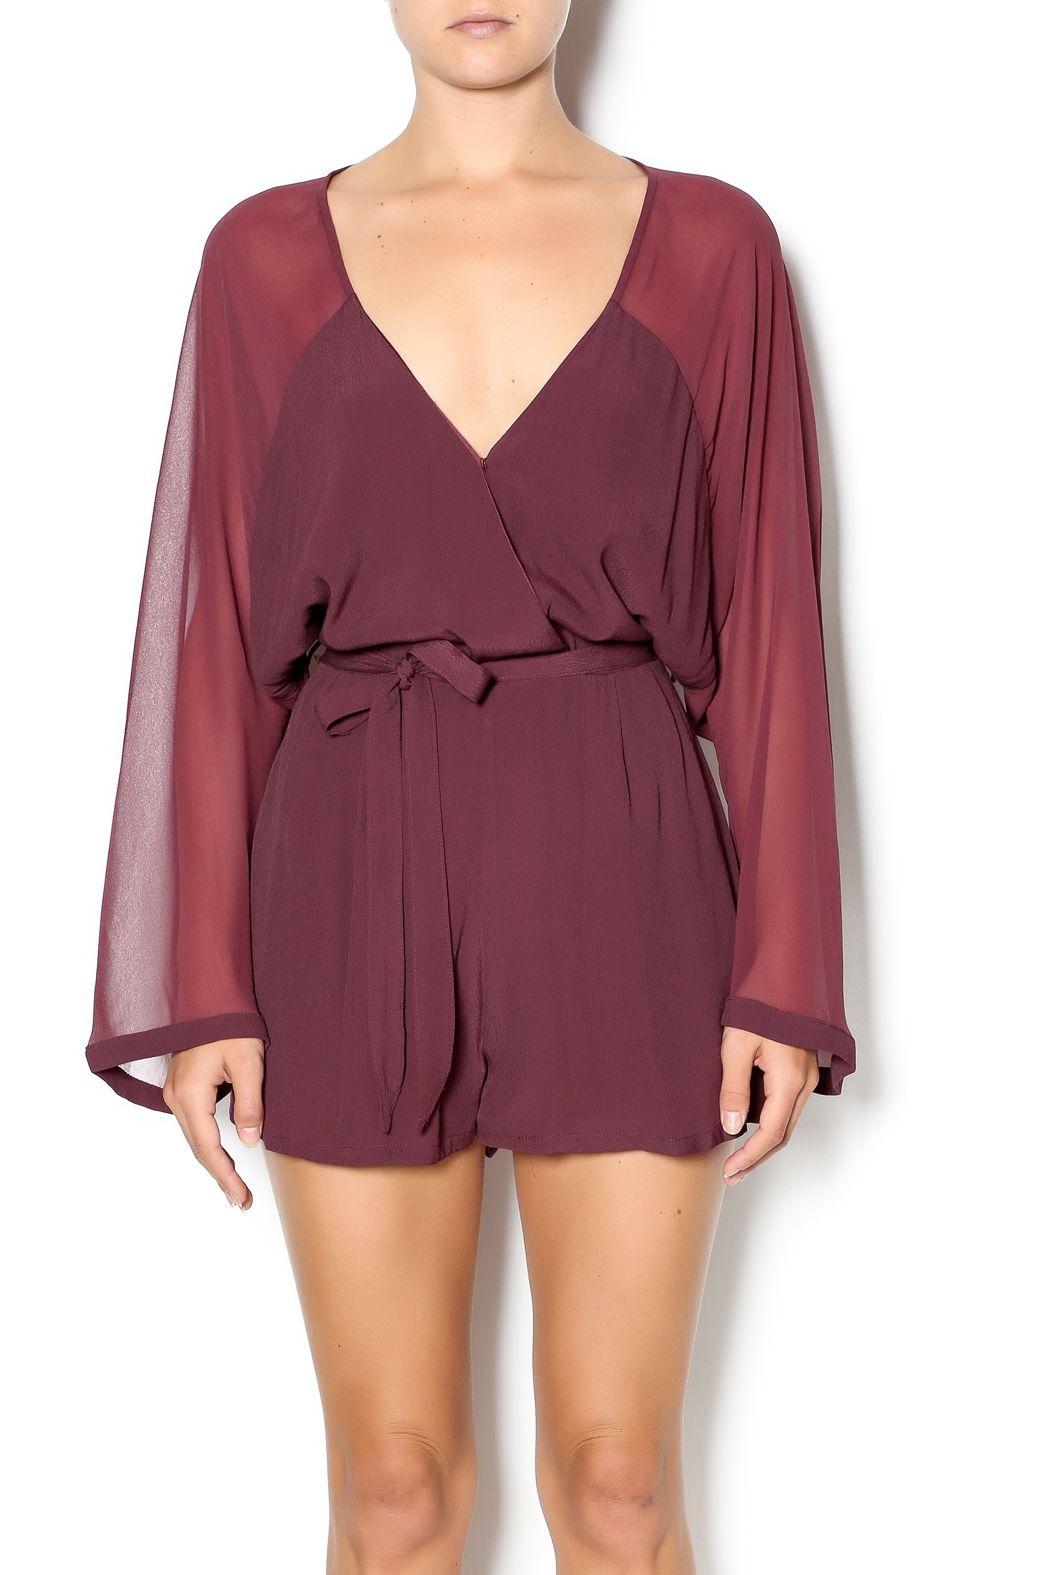 Long Sleeve Chiffon Romper — So cute for date night!